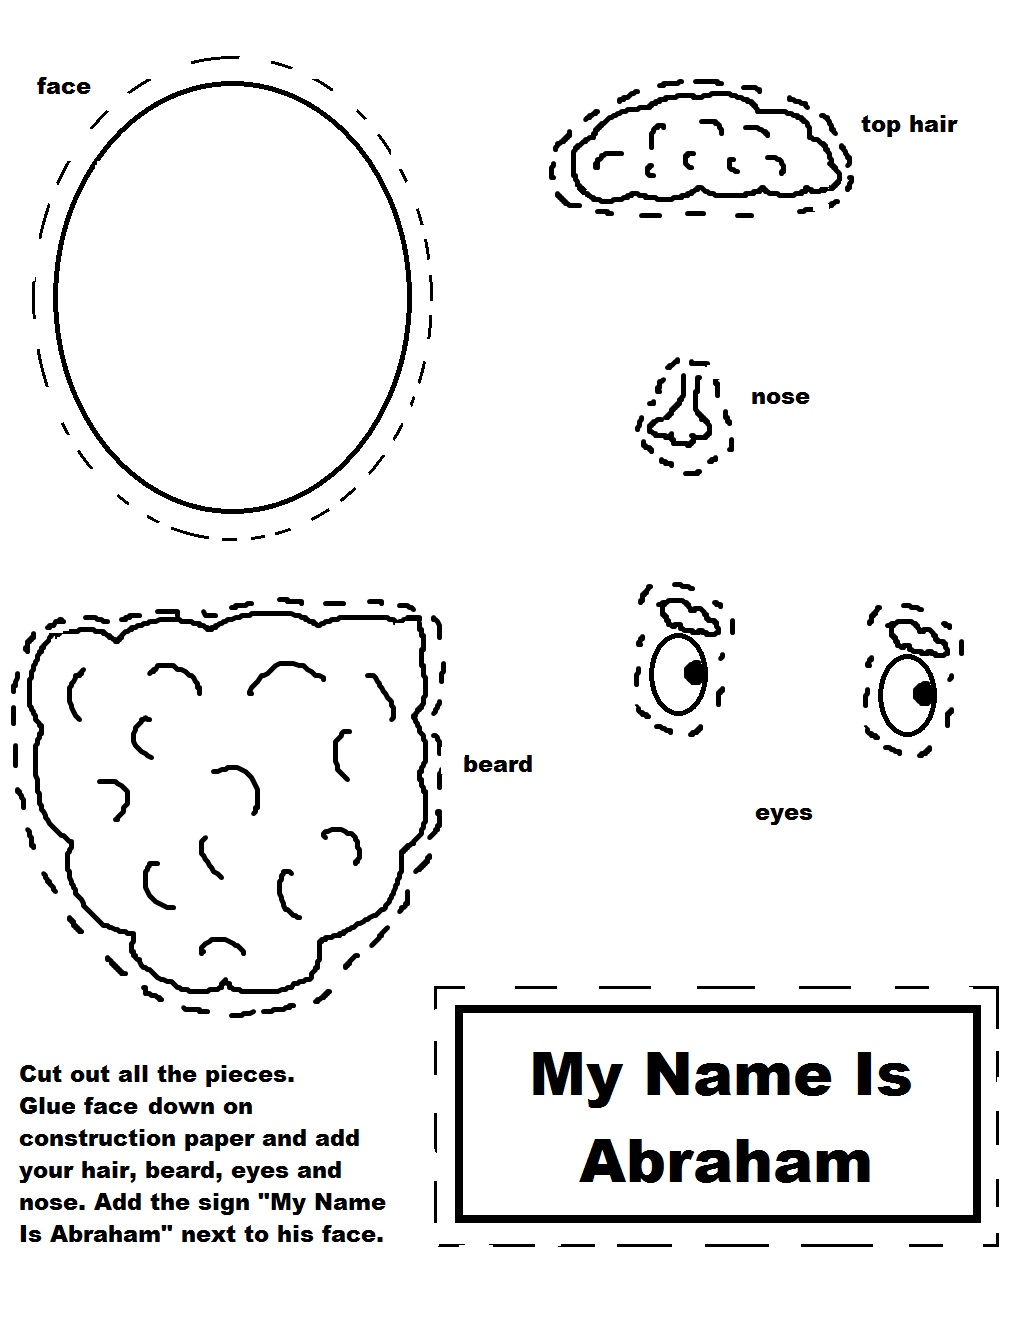 Abraham Sunday School Lessons Preschool Kids Bible Lesson